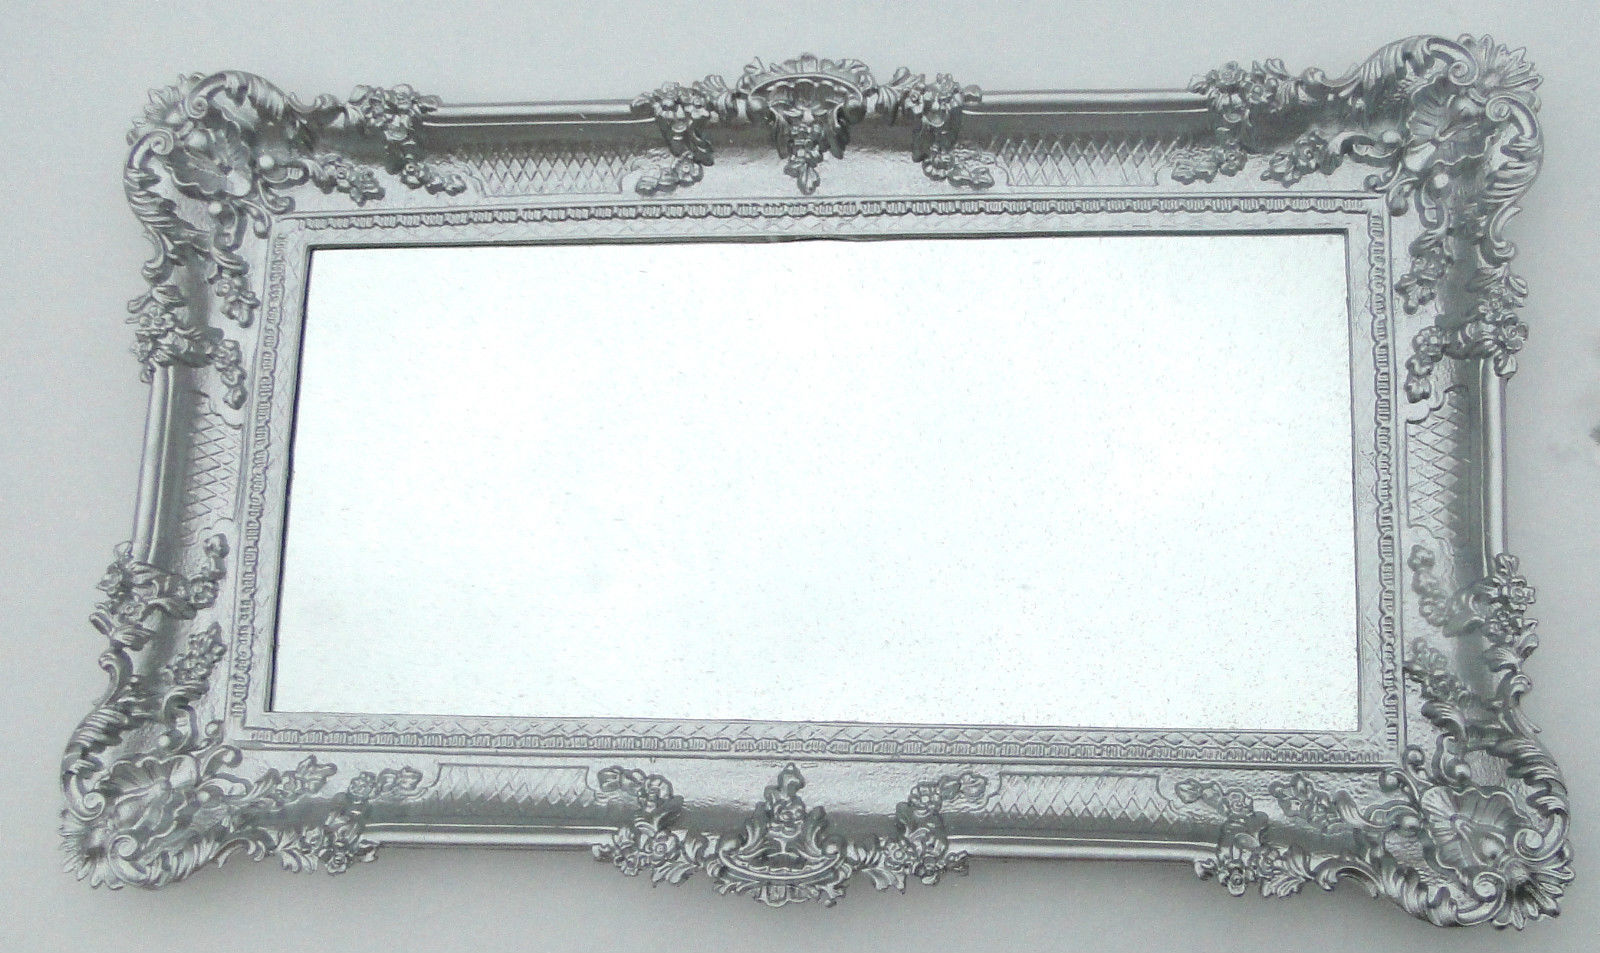 wandspiegel silber barock flur spiegel antik 97x57. Black Bedroom Furniture Sets. Home Design Ideas